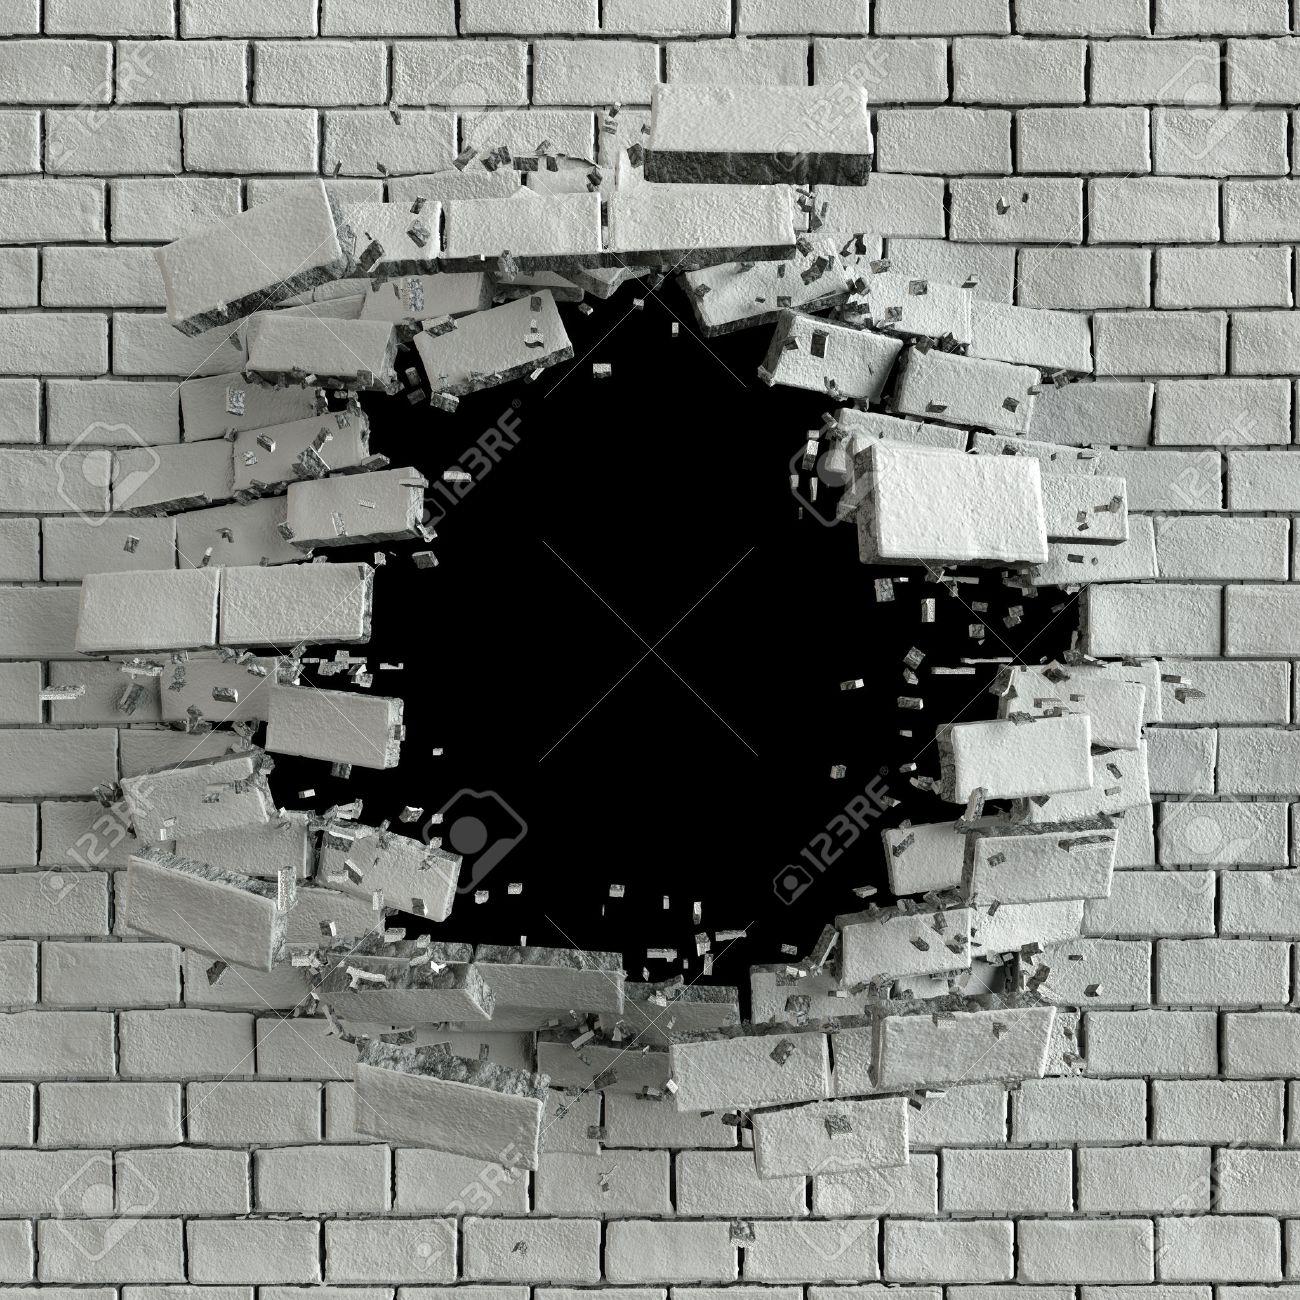 3d render, 3d illustration, explosion, cracked brick wall, bullet hole, destruction, abstract background - 60195066